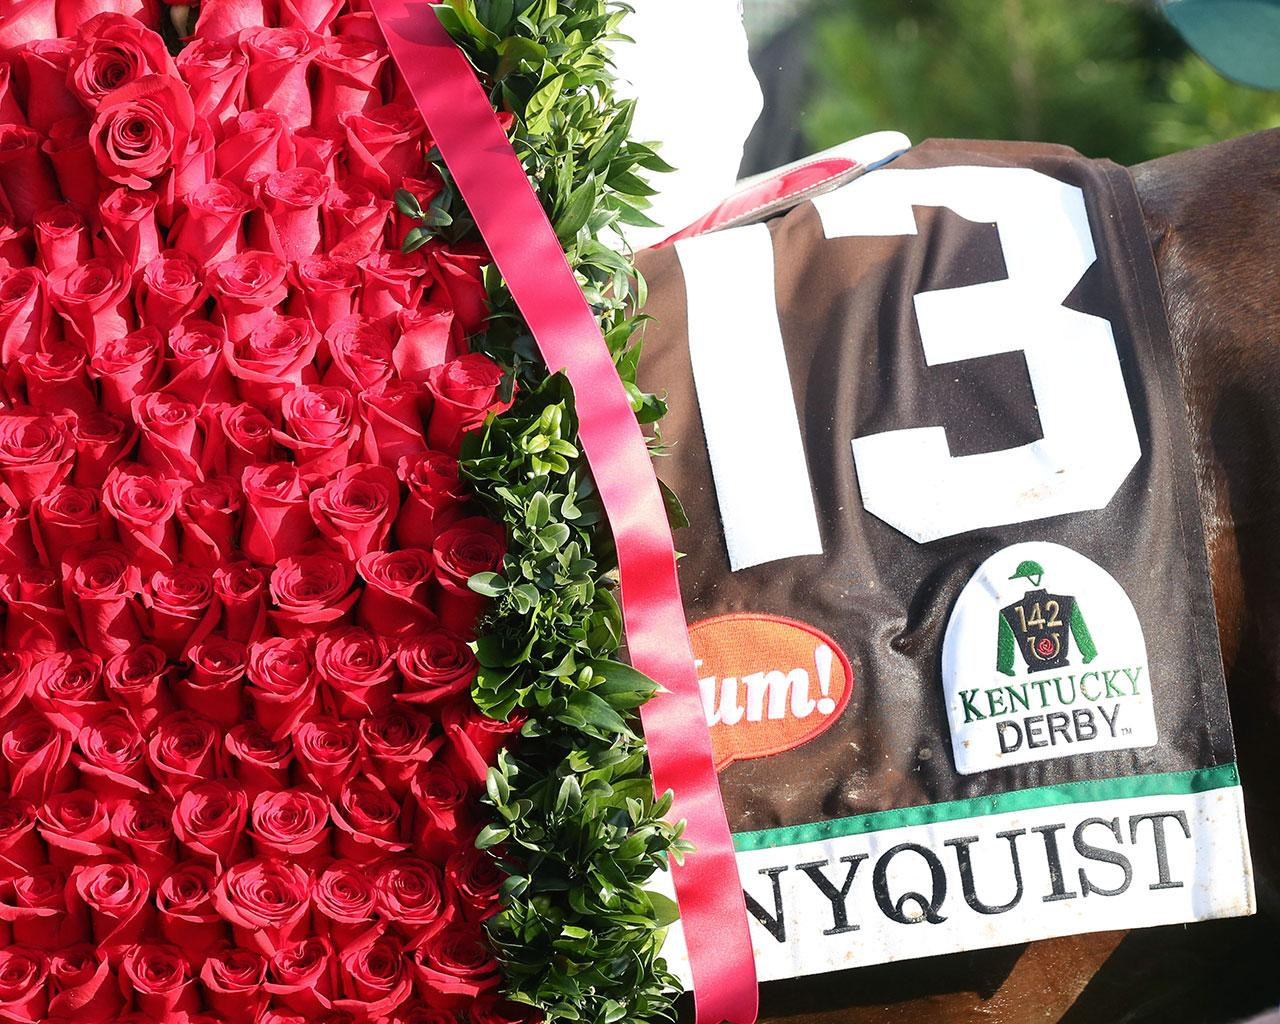 NYQUIST-The-Kentucky-Derby6